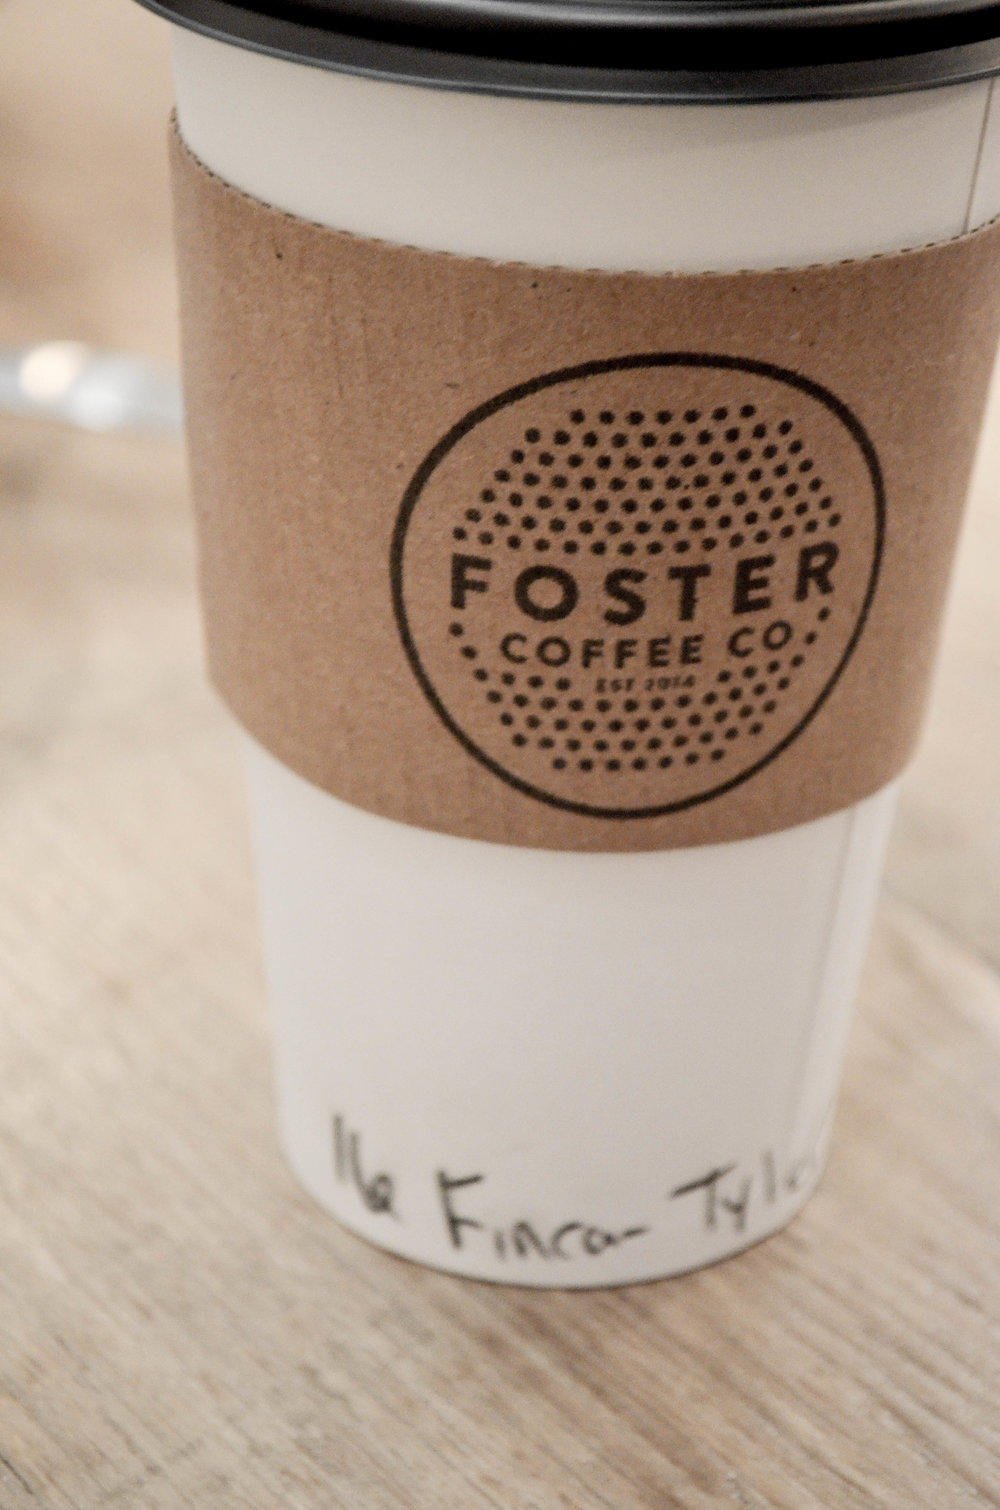 foster20.jpg